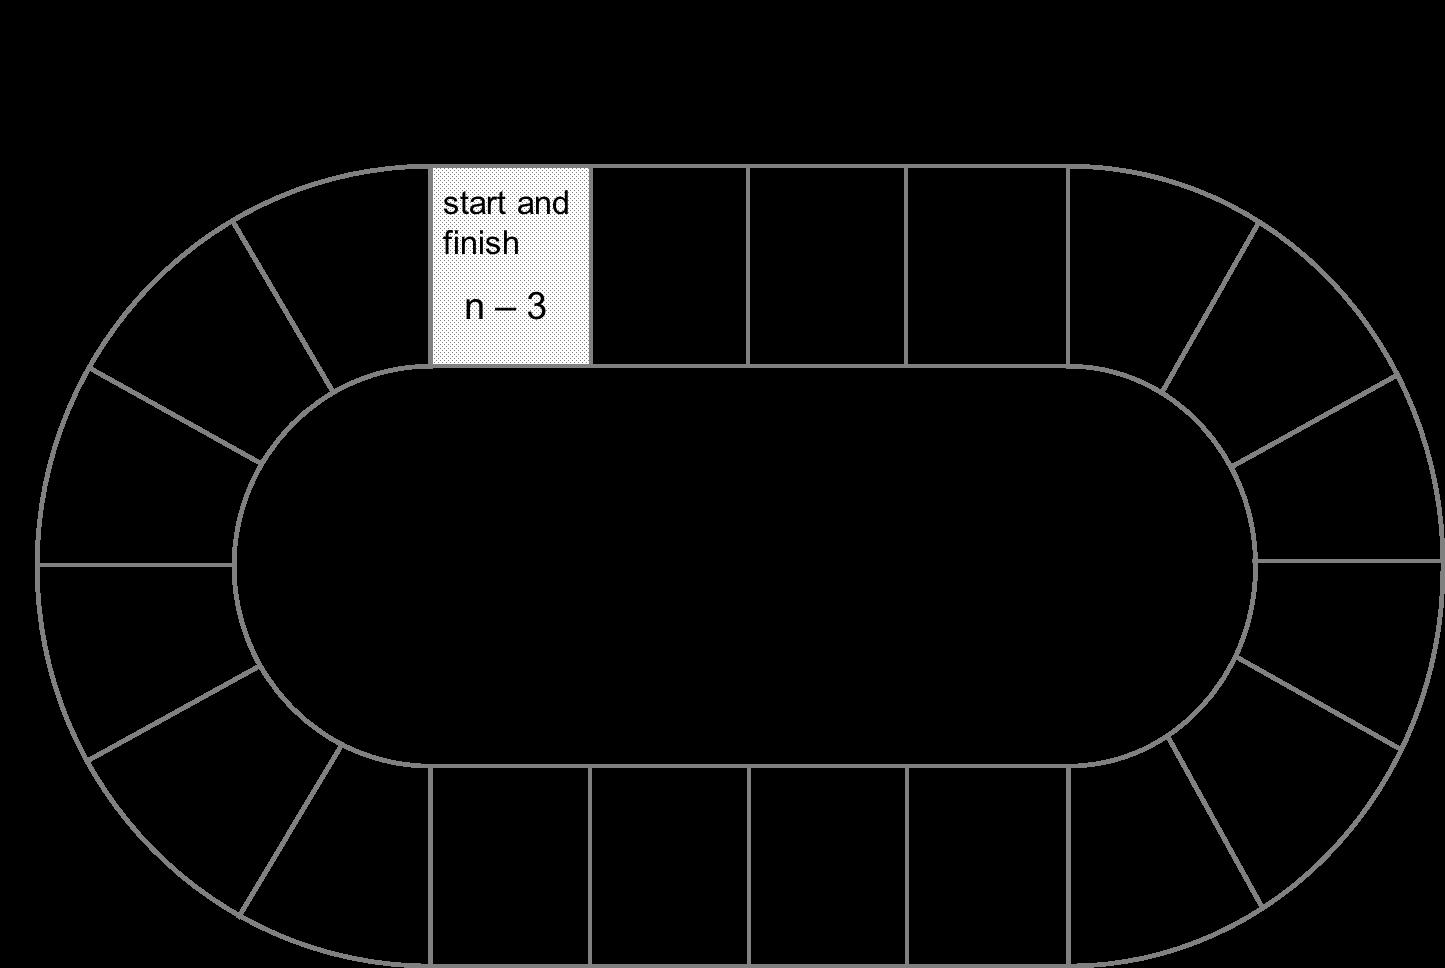 MEDIAN Don Steward mathematics teaching: racetrack substitution game